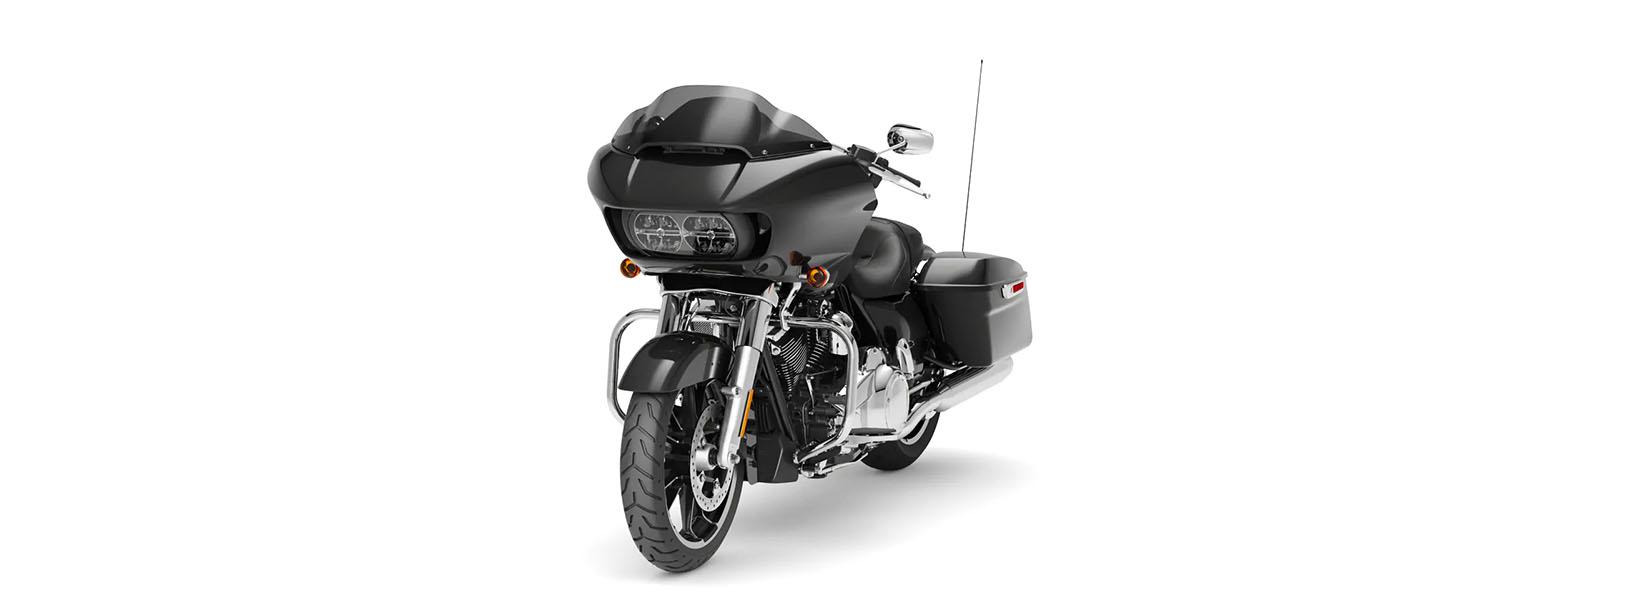 Electra Glide® Standard   2020 Motorcycles   Harley-Davidson